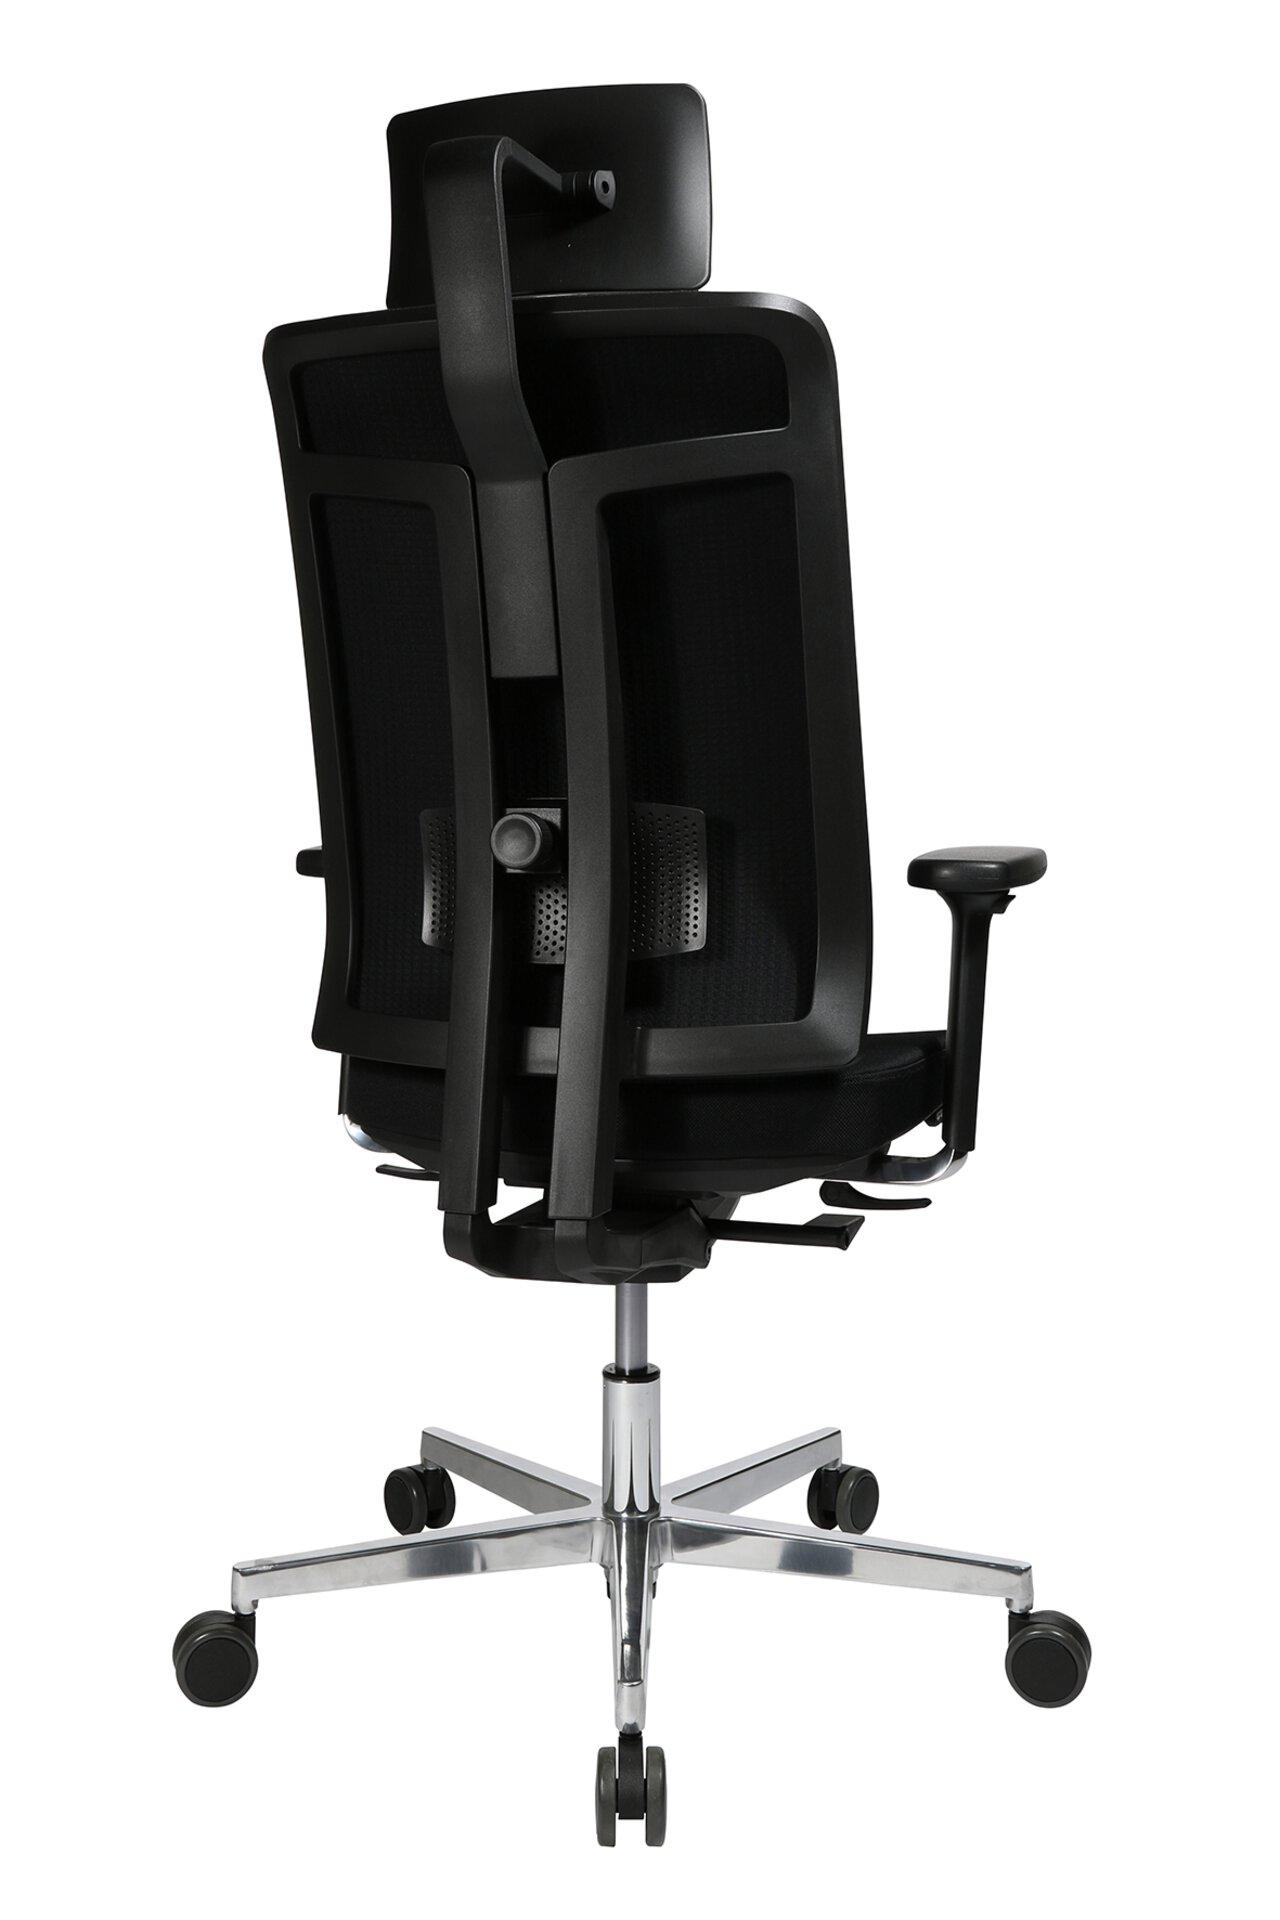 Büro-Drehstuhl M4 MONDO Textil schwarz 49 x 137 x 56 cm